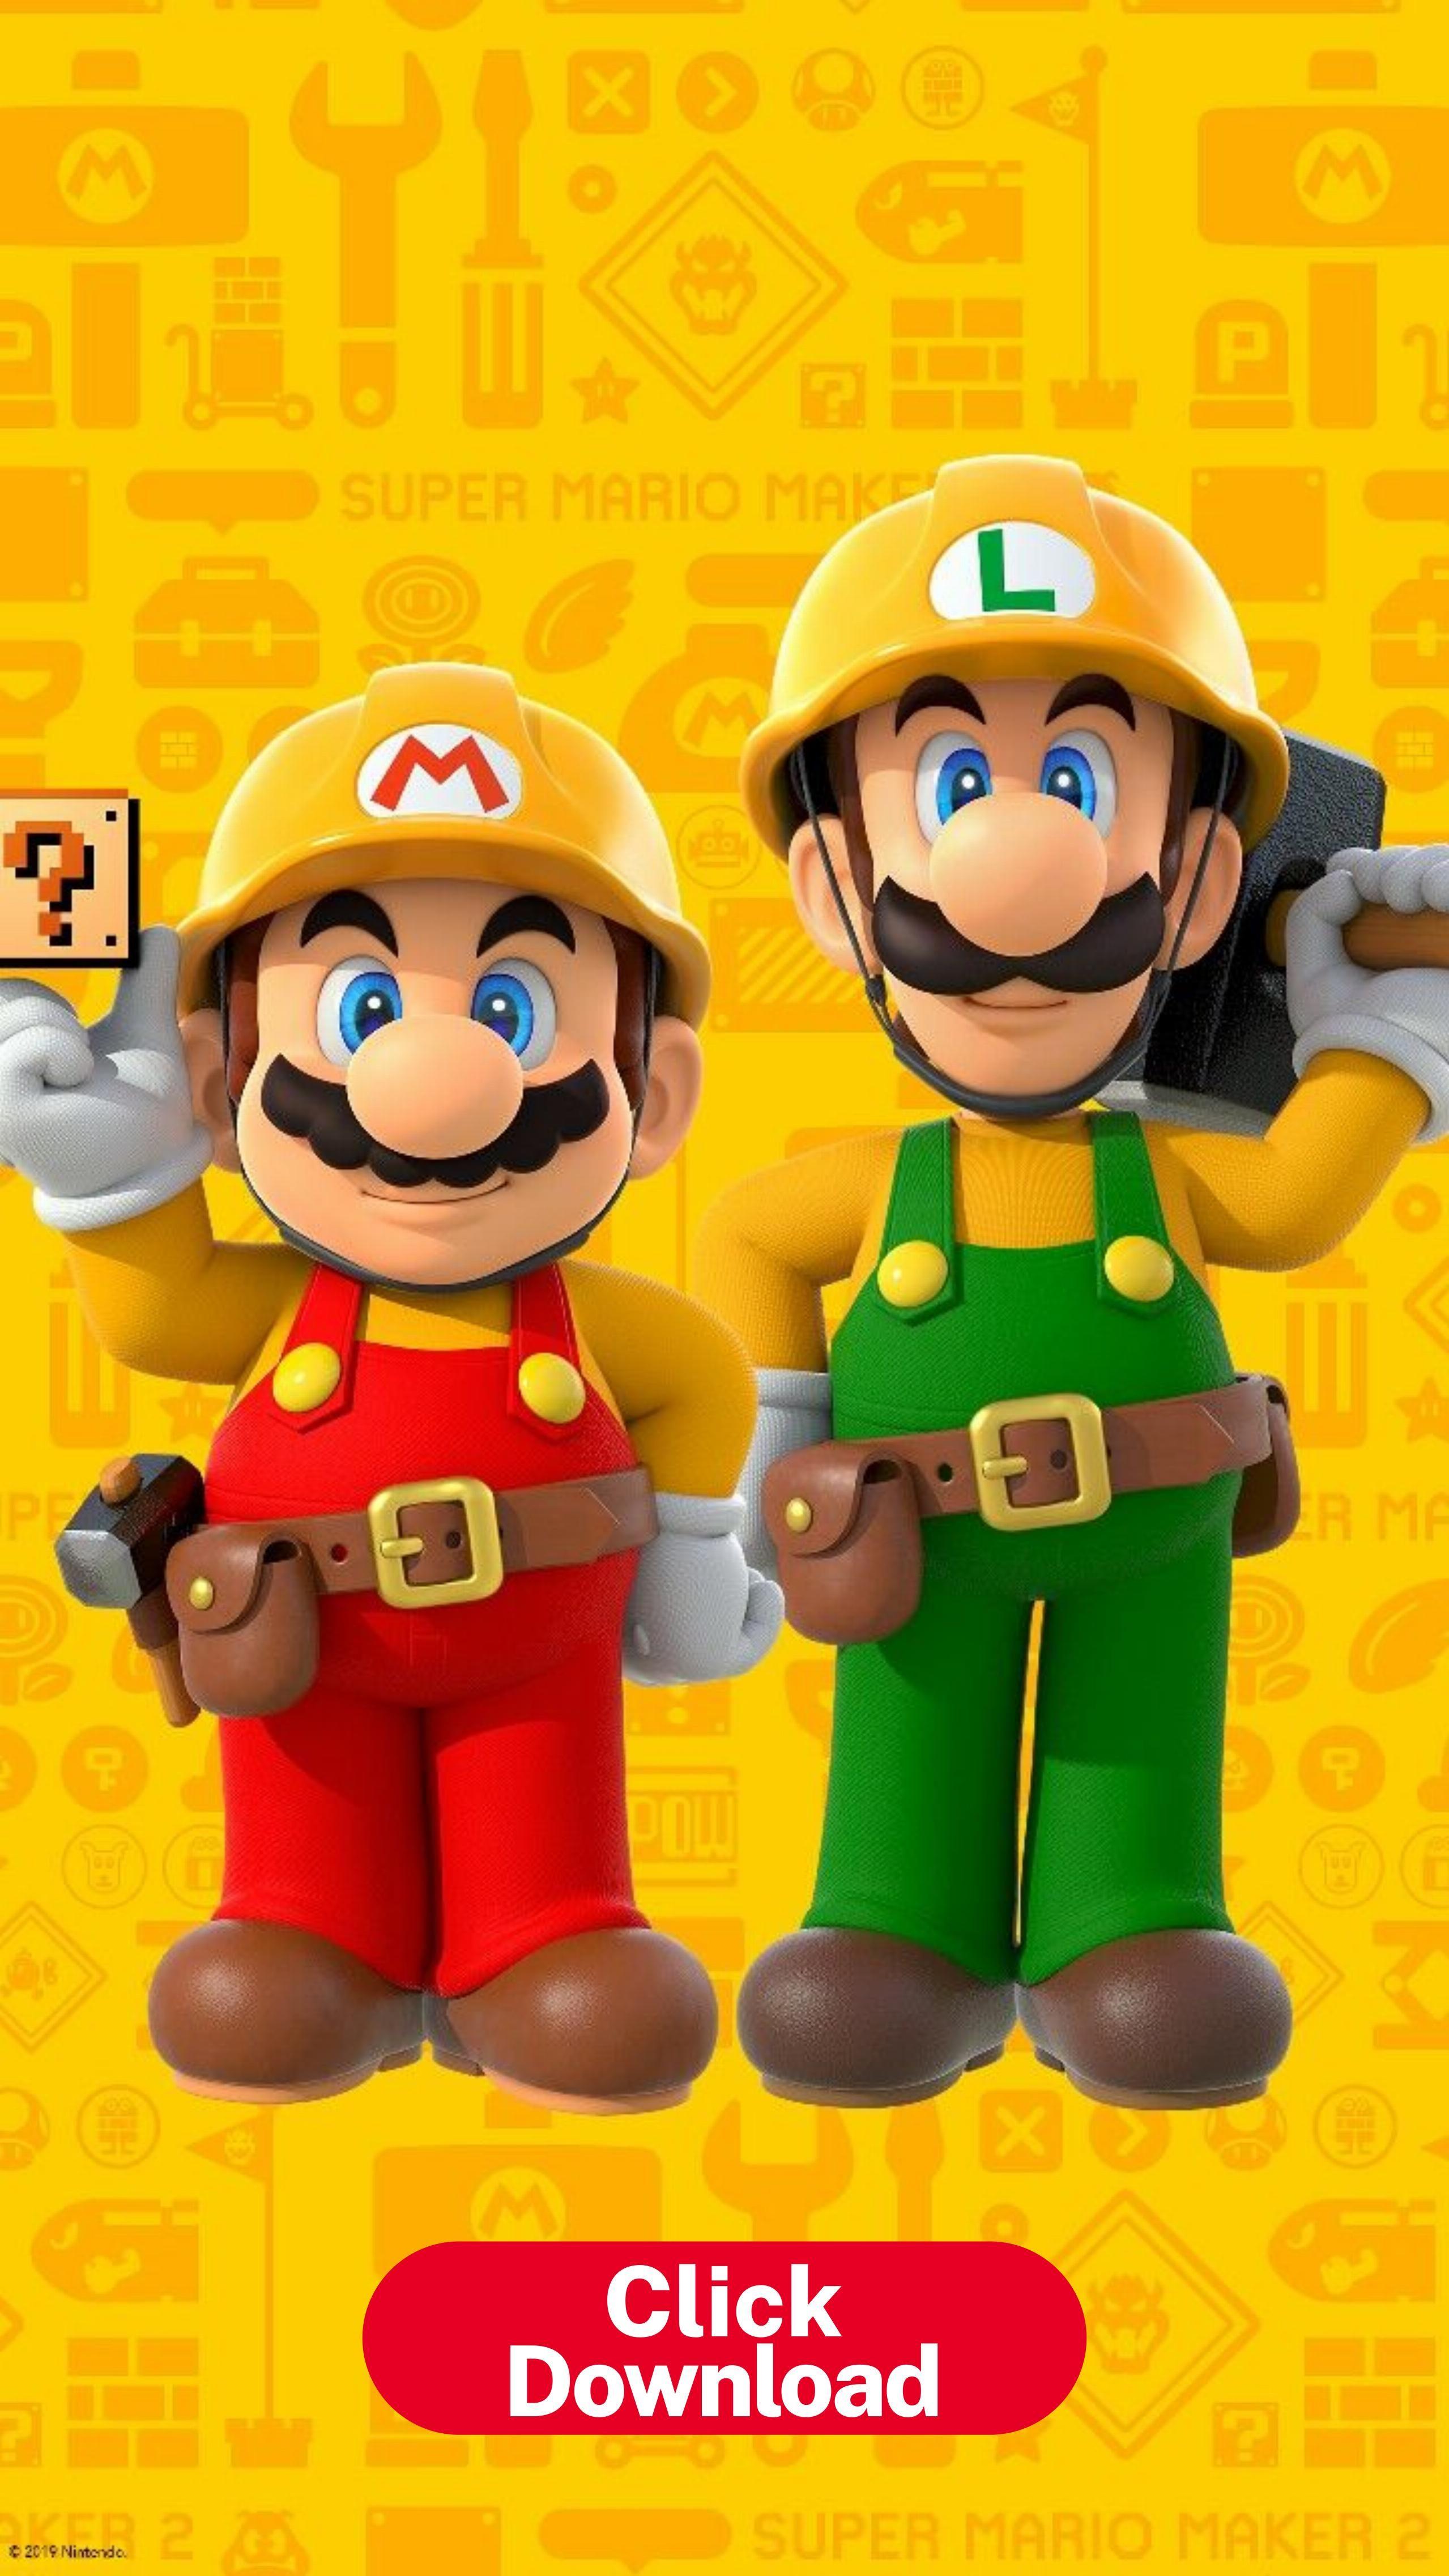 Mario Maker 2 Hd Phone Wallpaper Super Mario Super Mario Bros En 2020 Super Mario Bros Fondos De Pantalla Para Samsung Galaxy Fondos Mario Bross